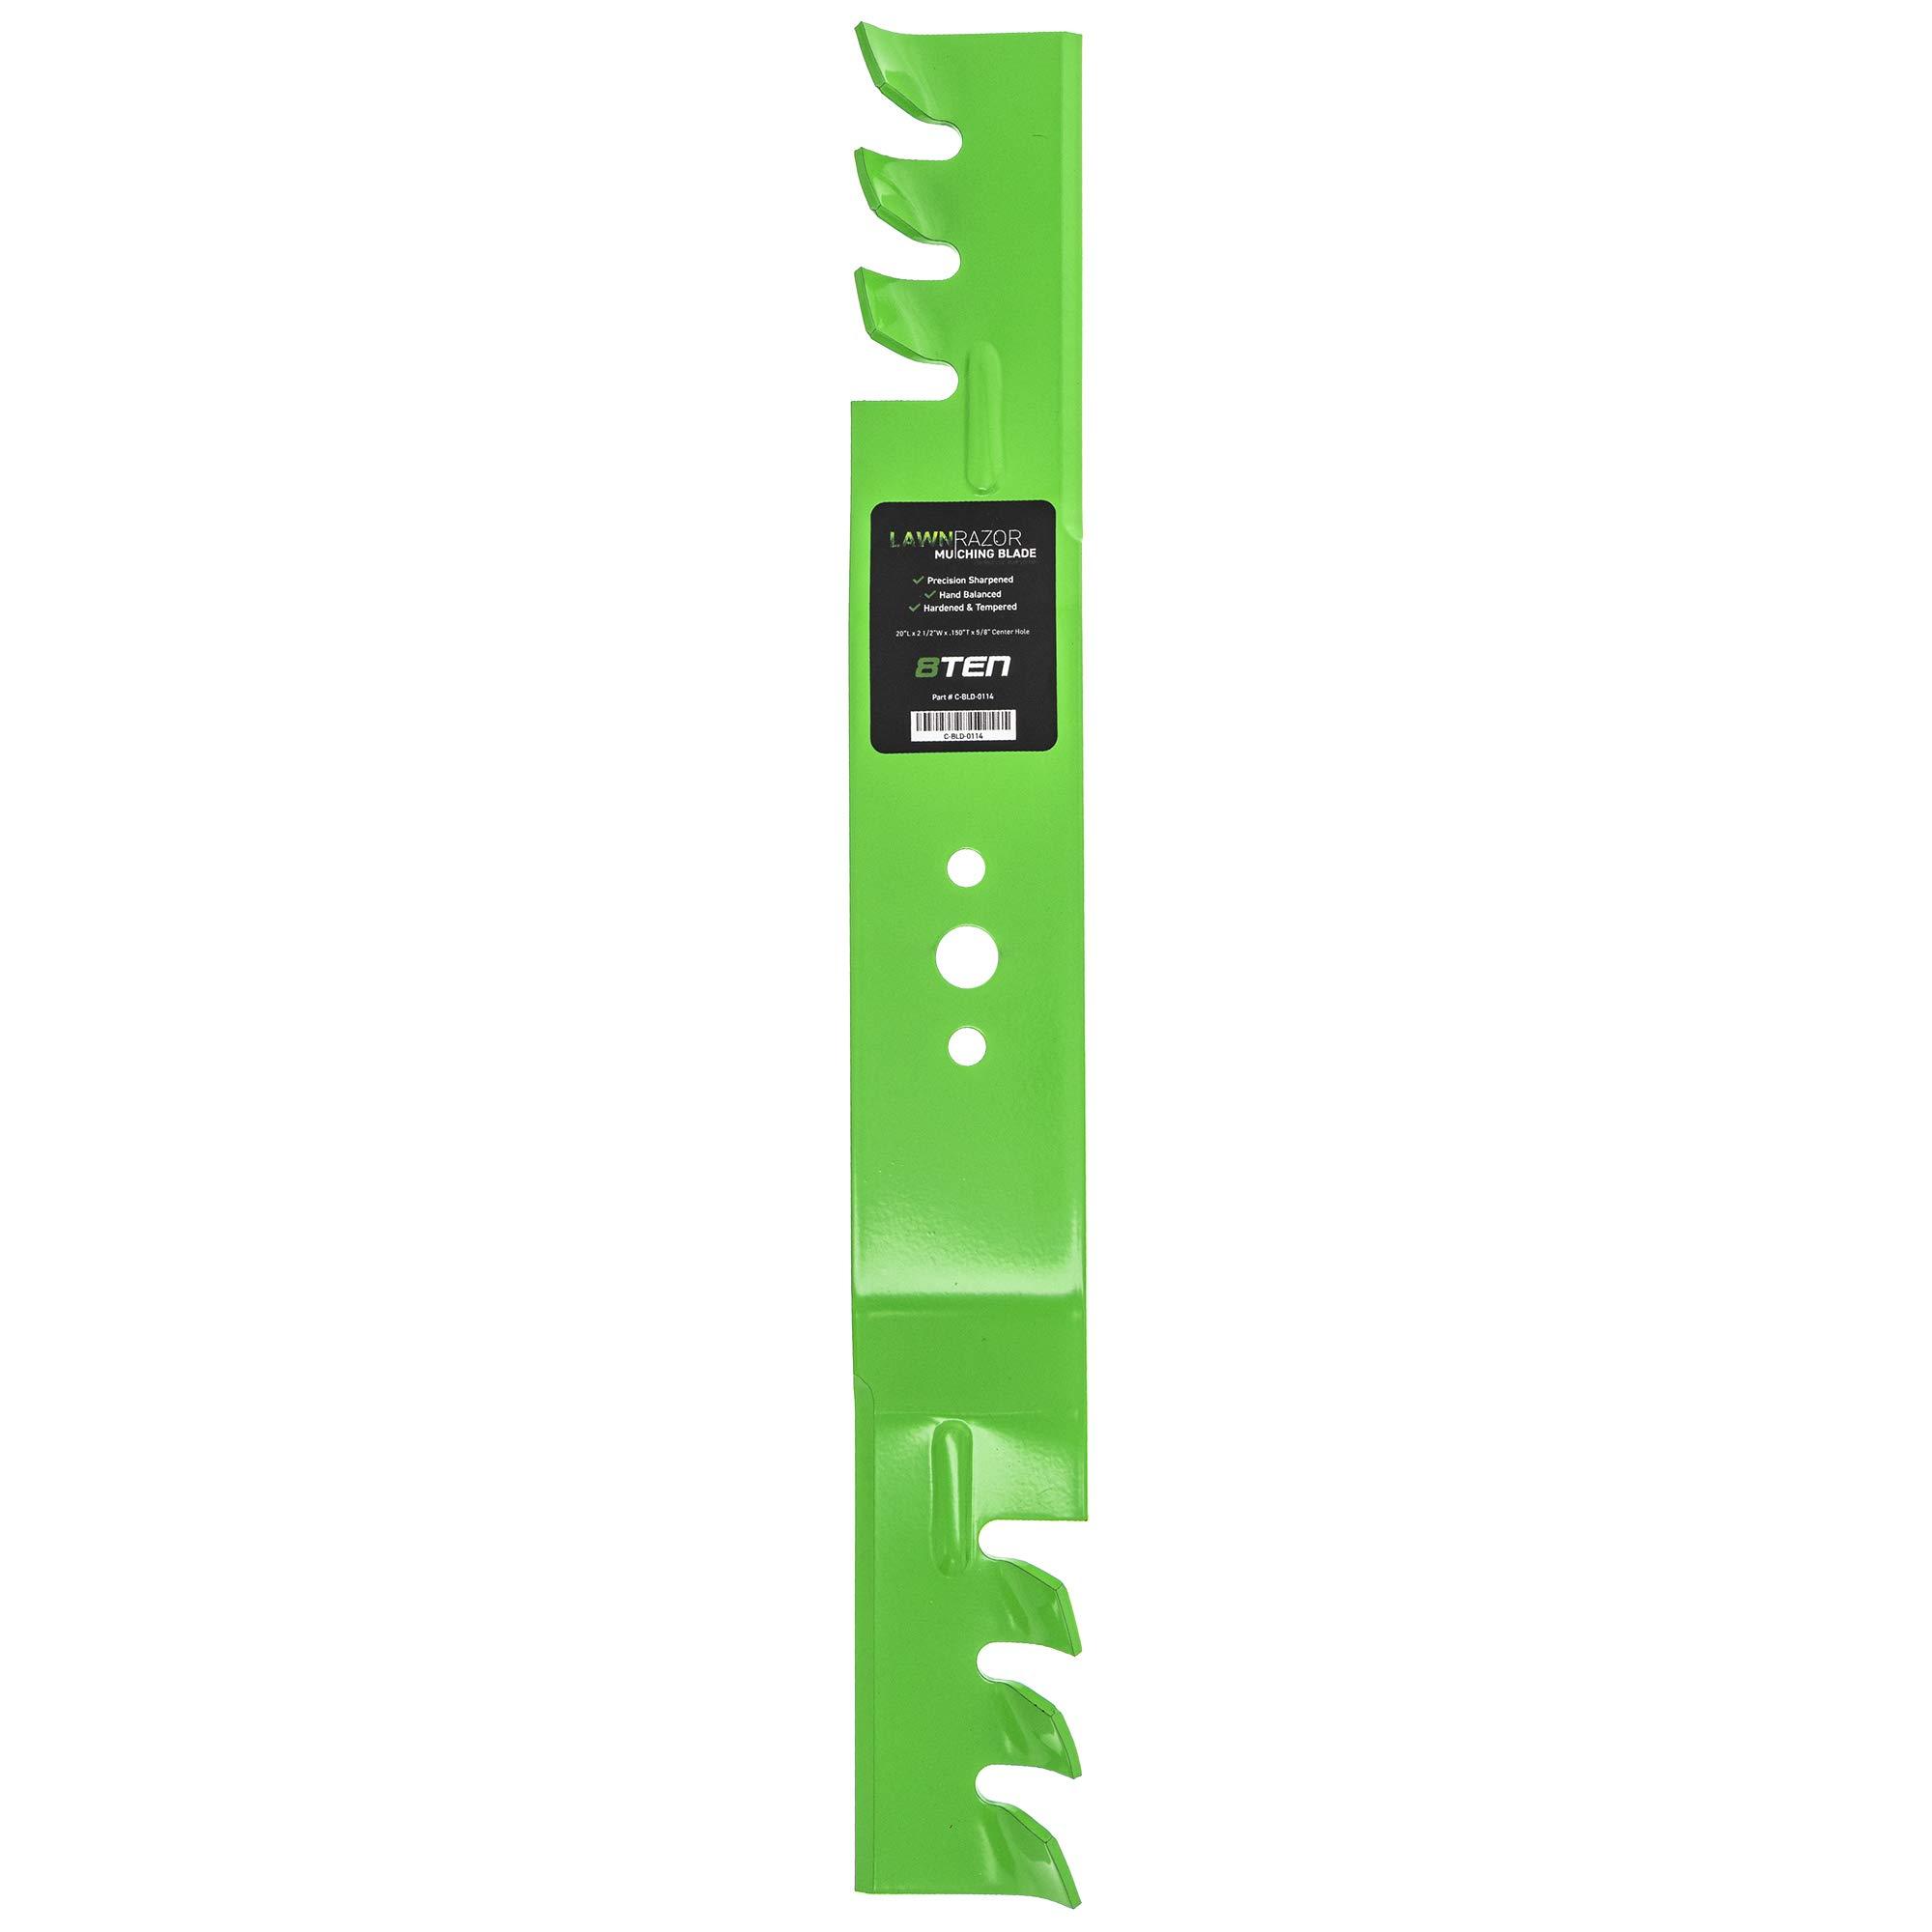 8TEN LawnRAZOR Mulching Blade 20 inch Deck for AYP Craftsman Husqvarna Poulan 850972 145106 532850972 532145106